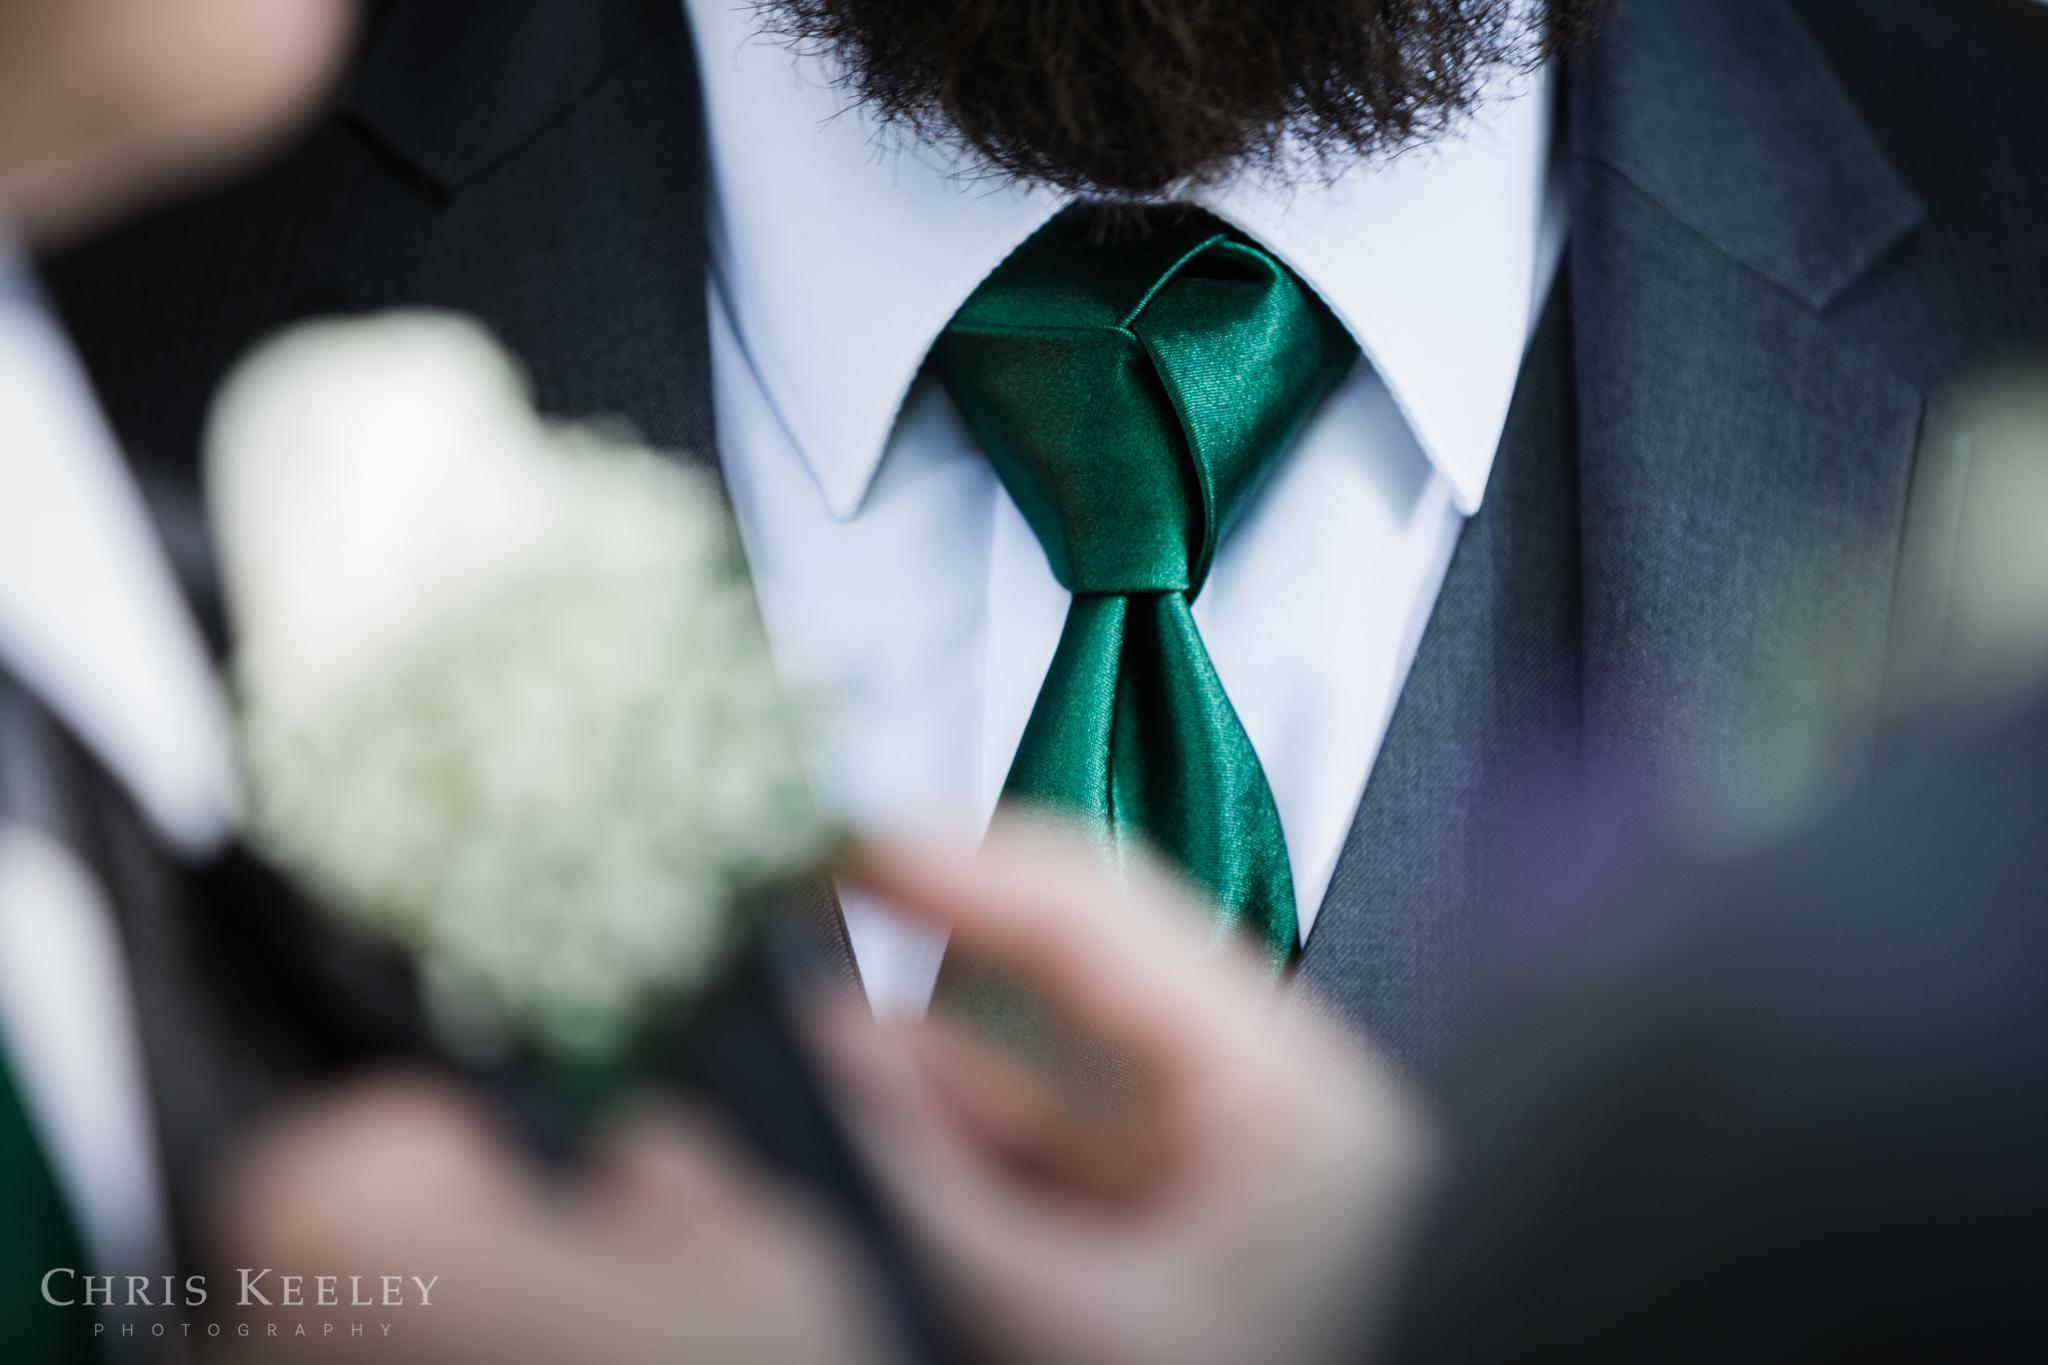 new-hampshire-wedding-photographer-three-chimneys-inn-chris-keeley-photography-04.jpg